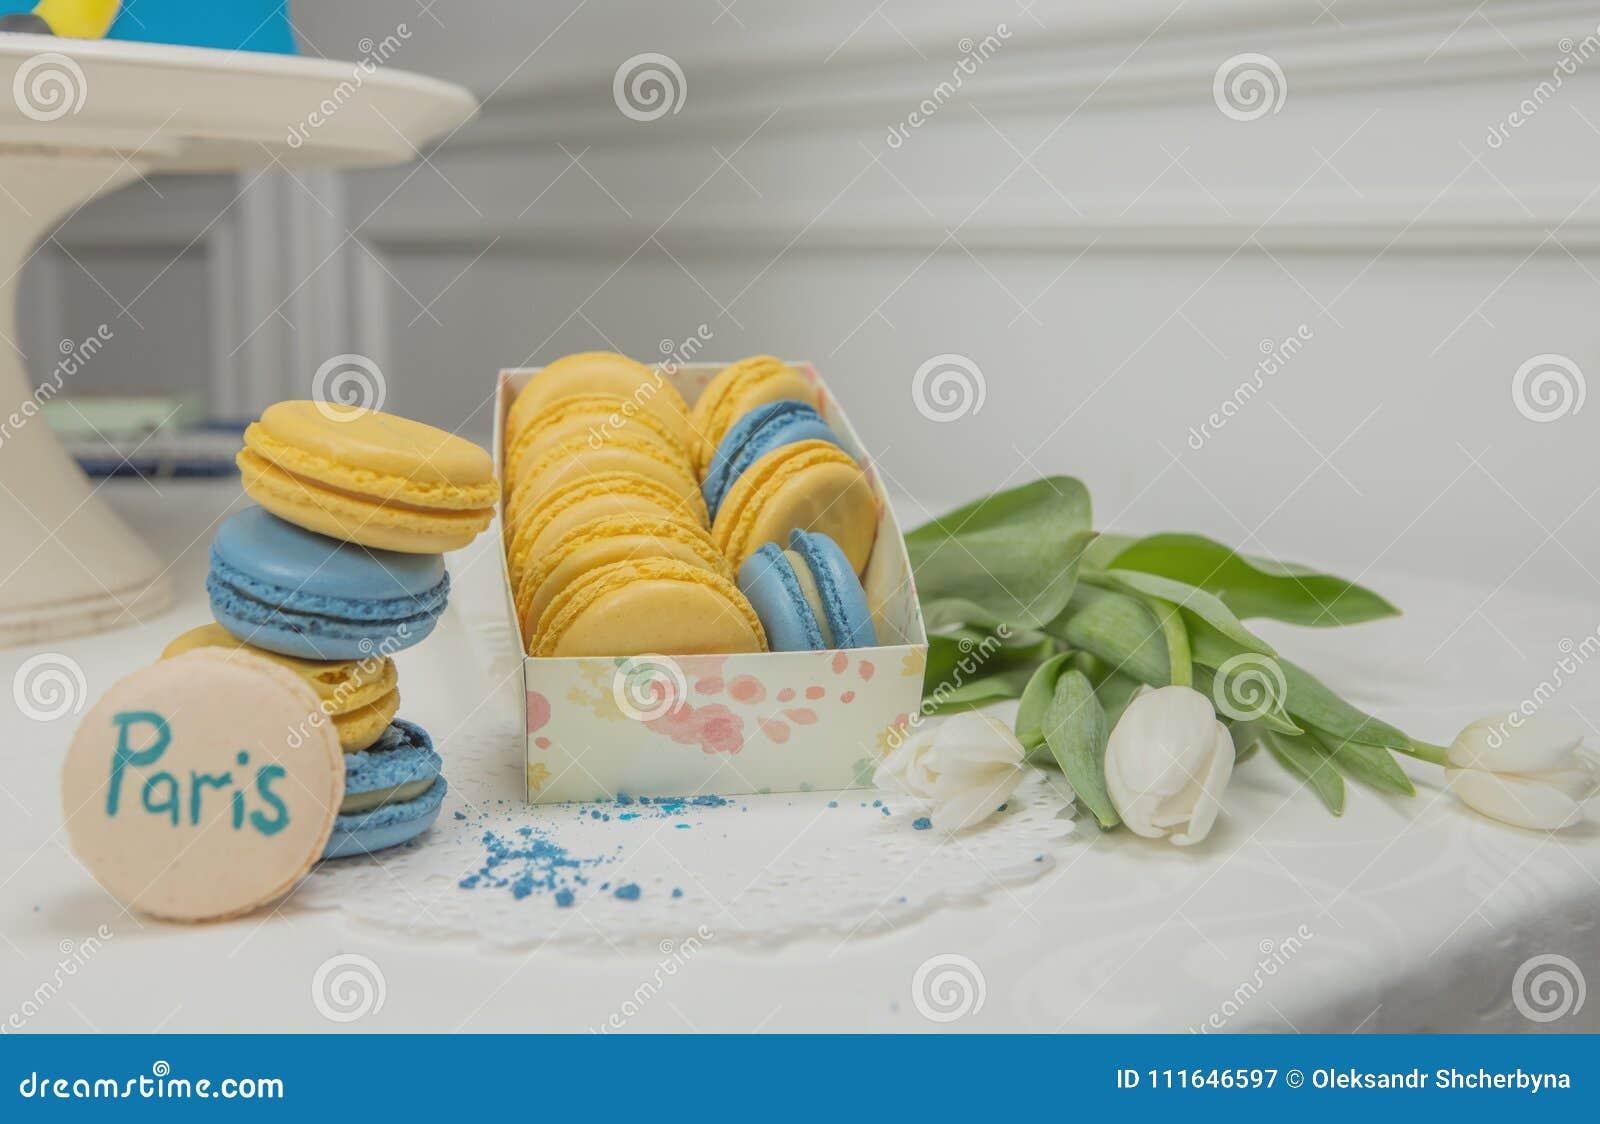 Zoete Franse makaron op witte witte achtergrond vlieg dalende zoete macaroni